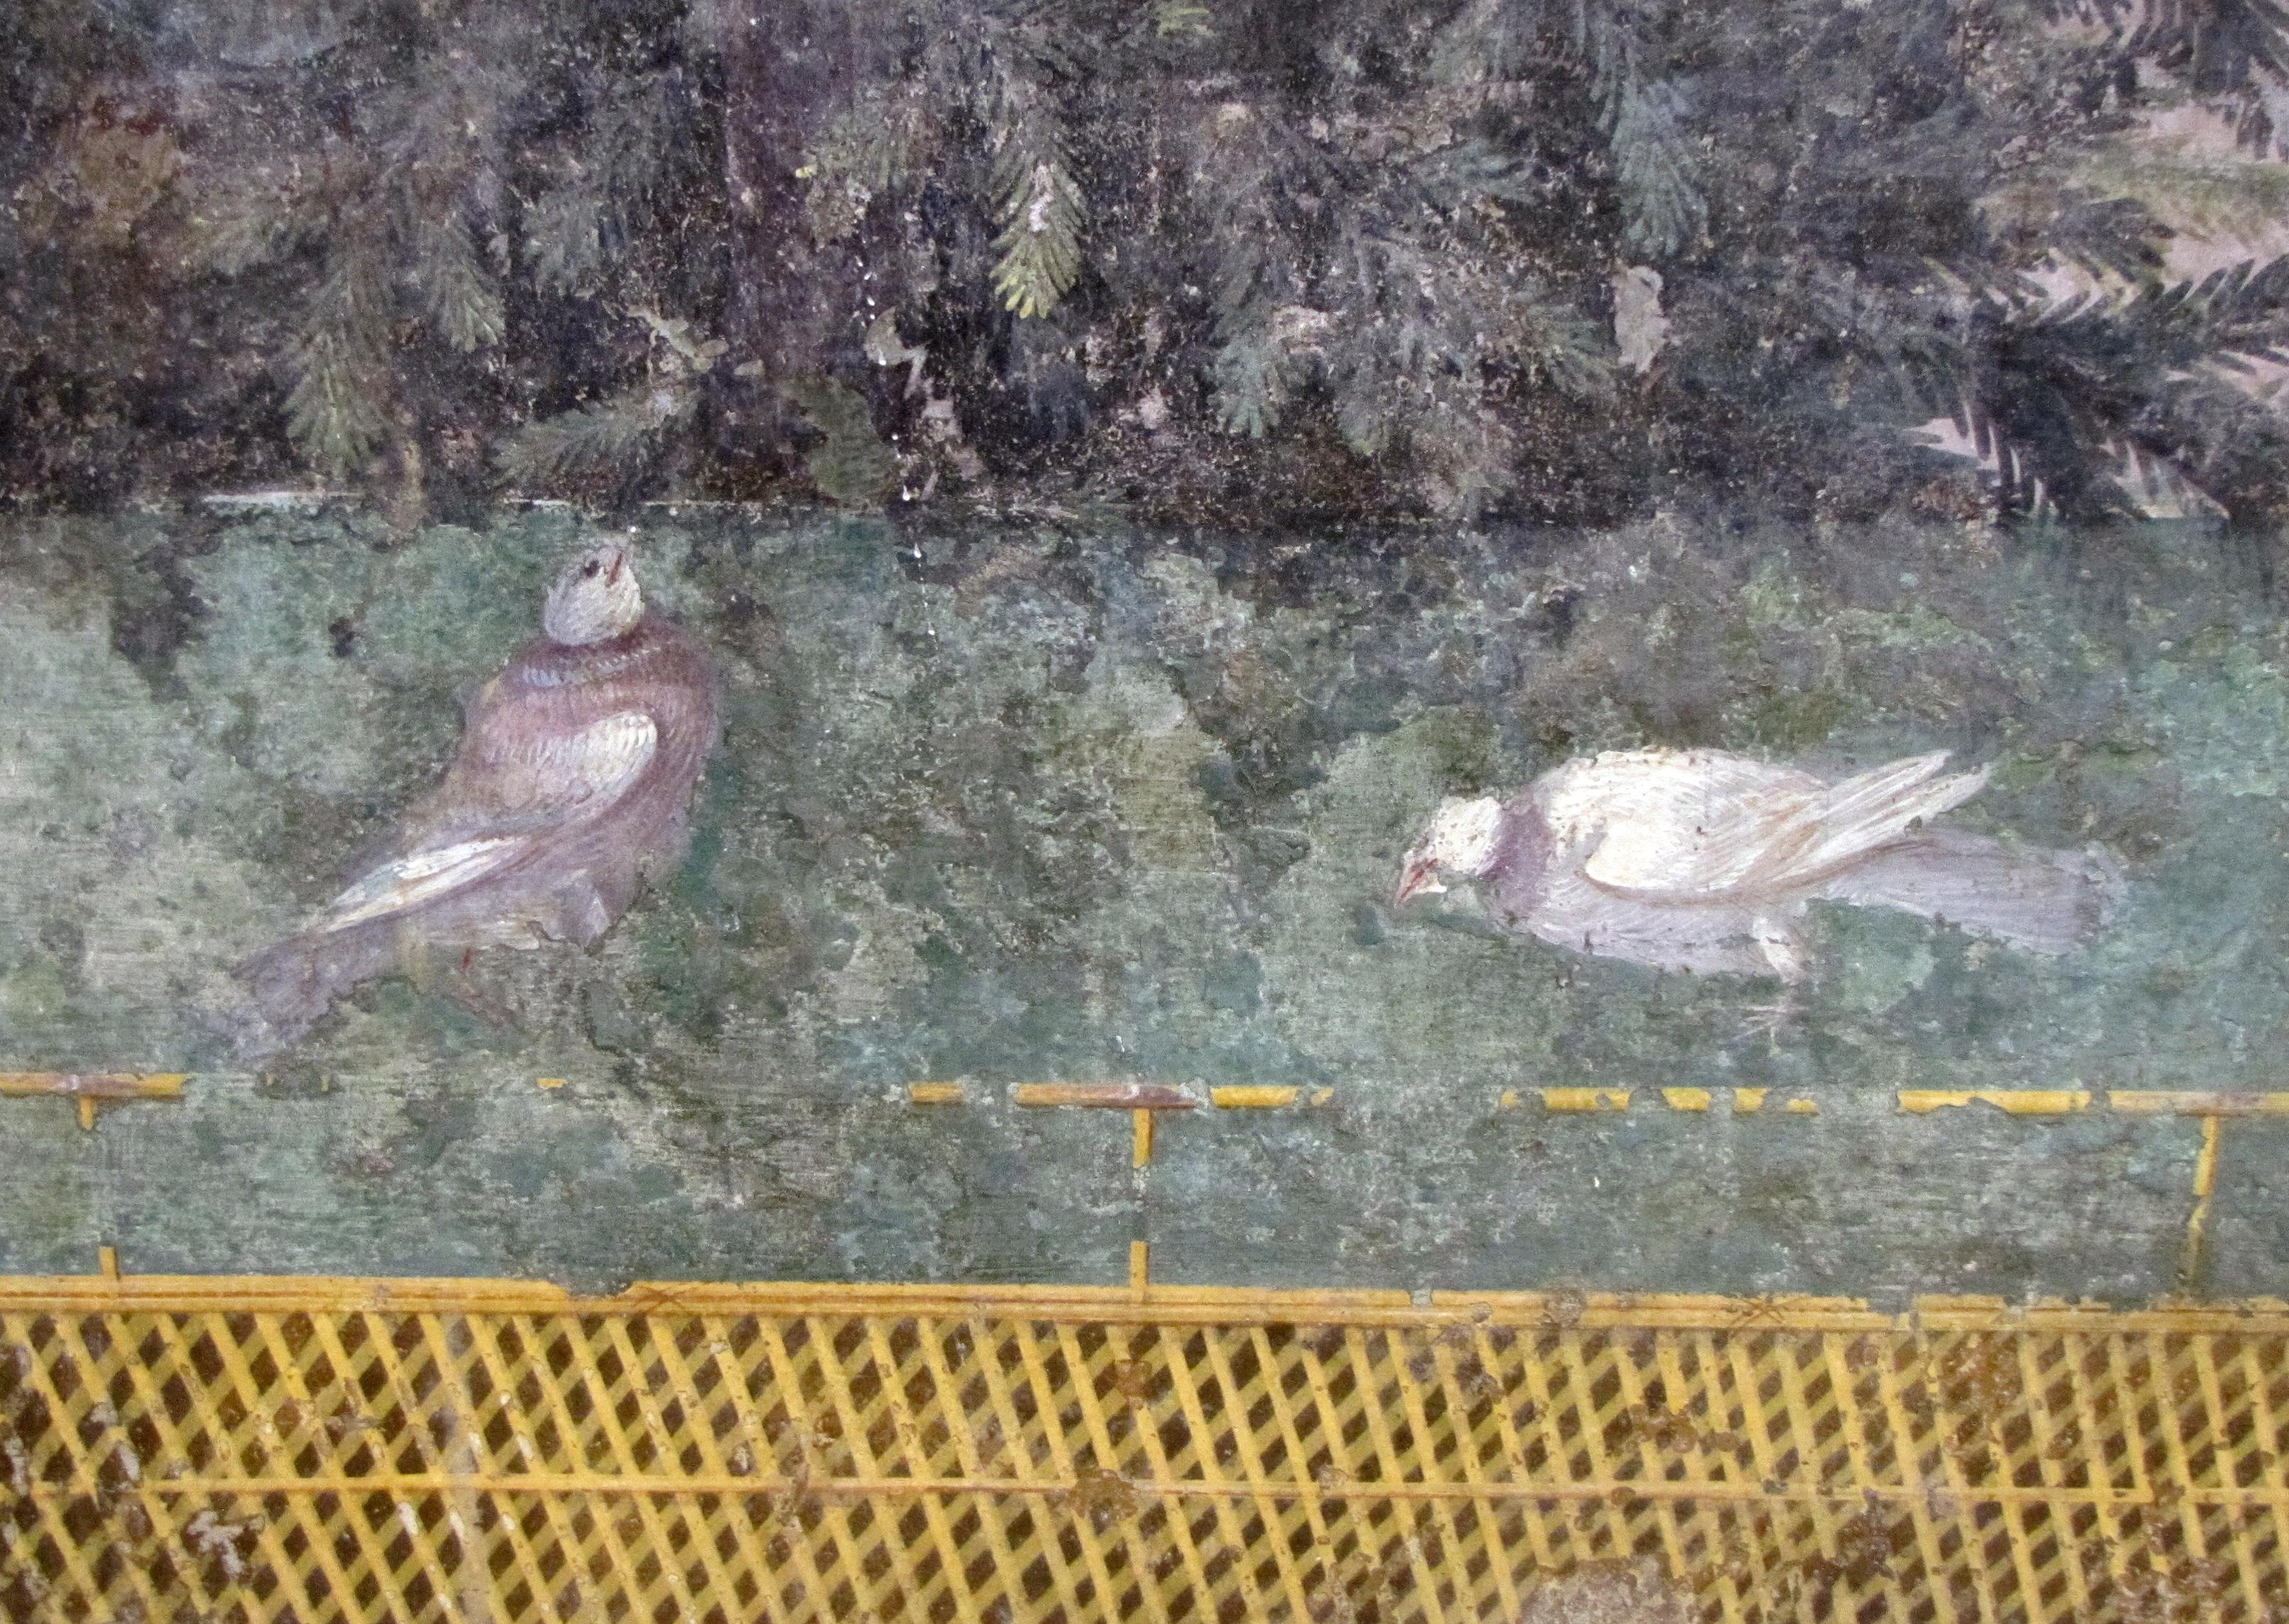 Wood Pigeon or Rockdove